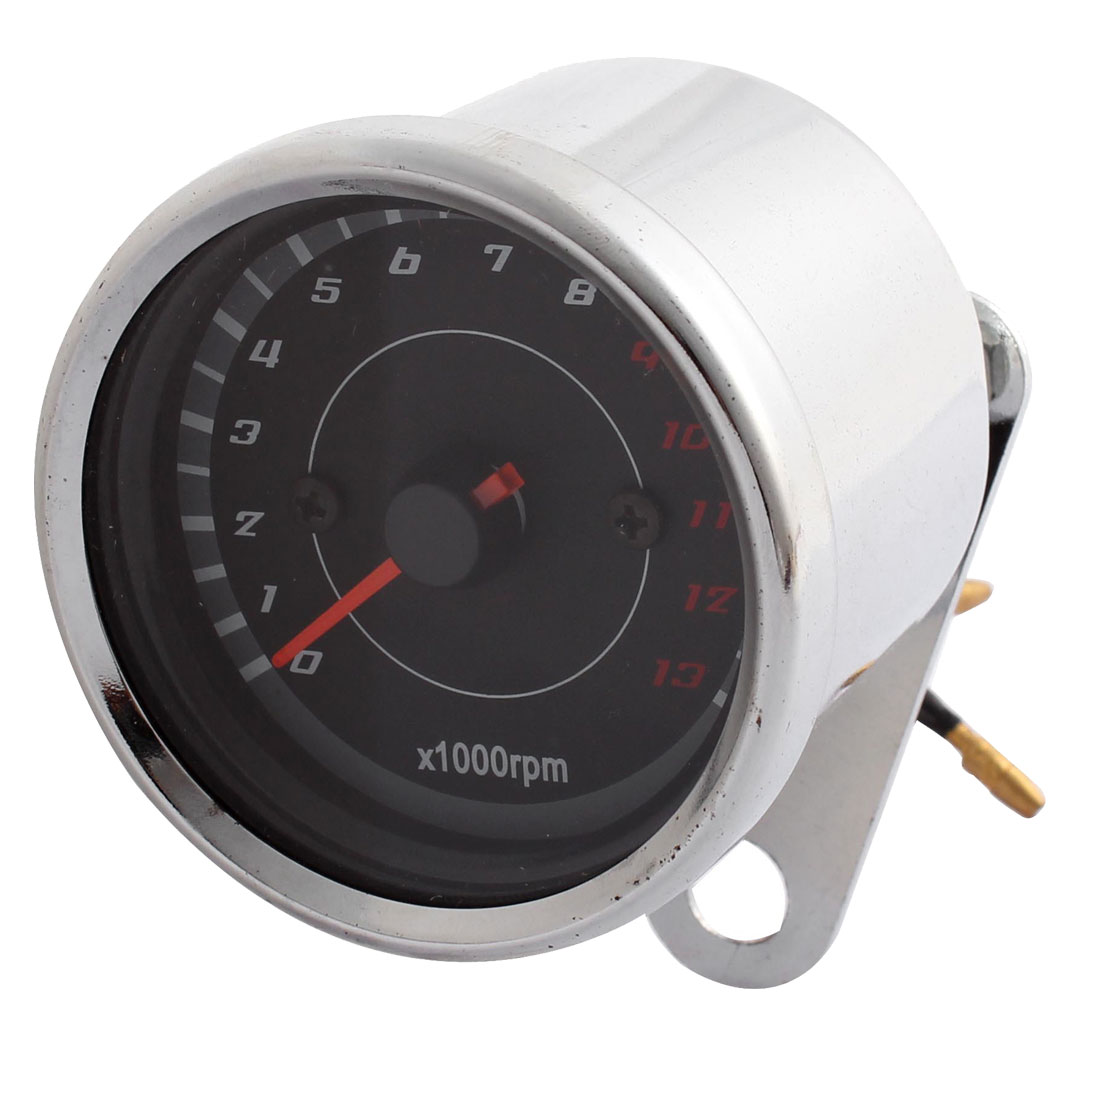 0-13000RPM Motorbike Stainless Steel Housing Tachometer Speedometer Tacho Gauge